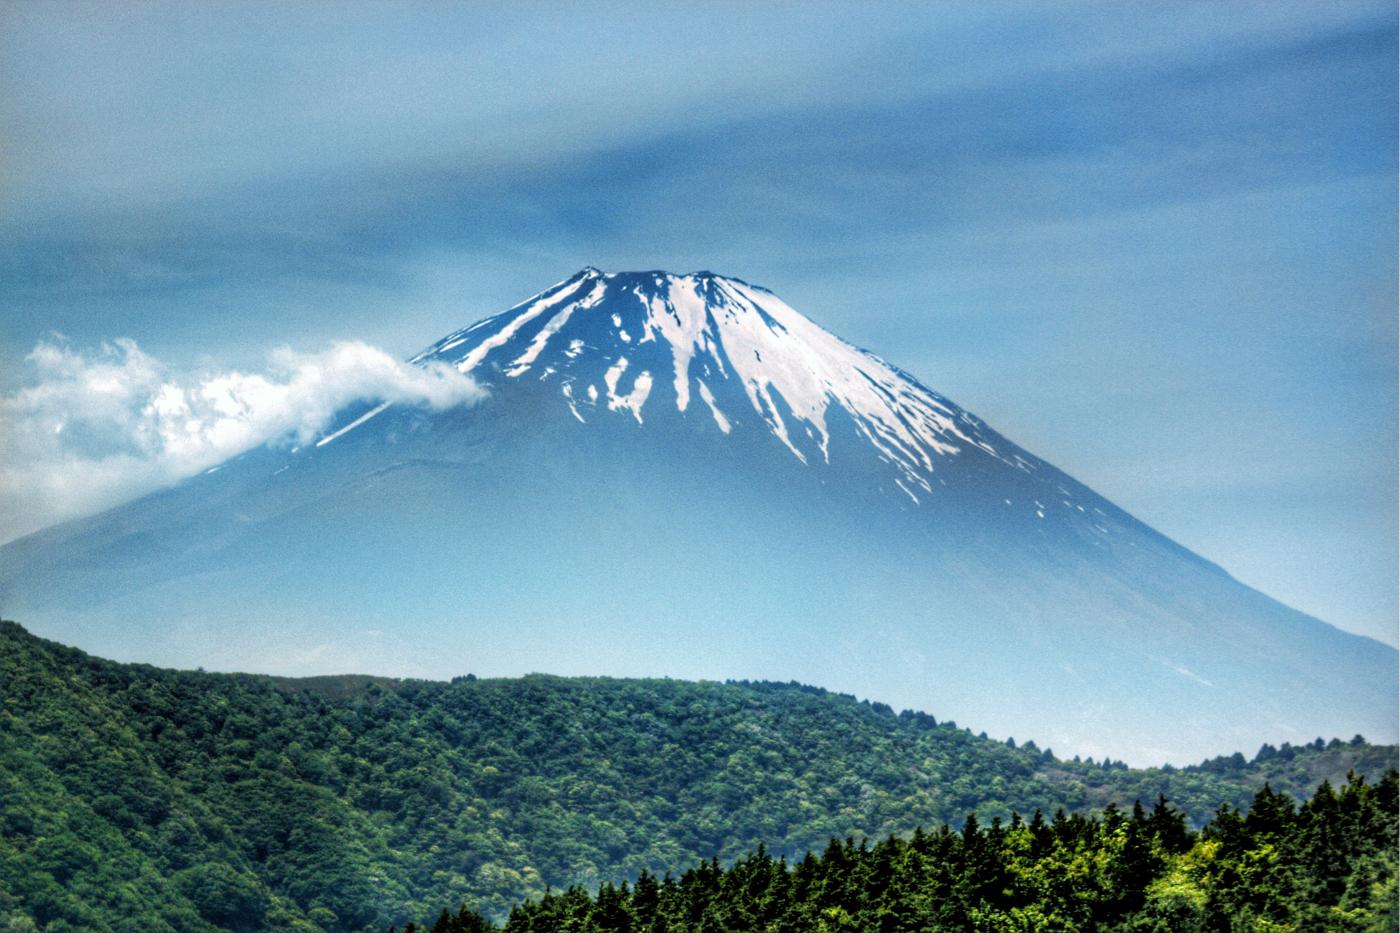 Fuji, Japan, Hakone